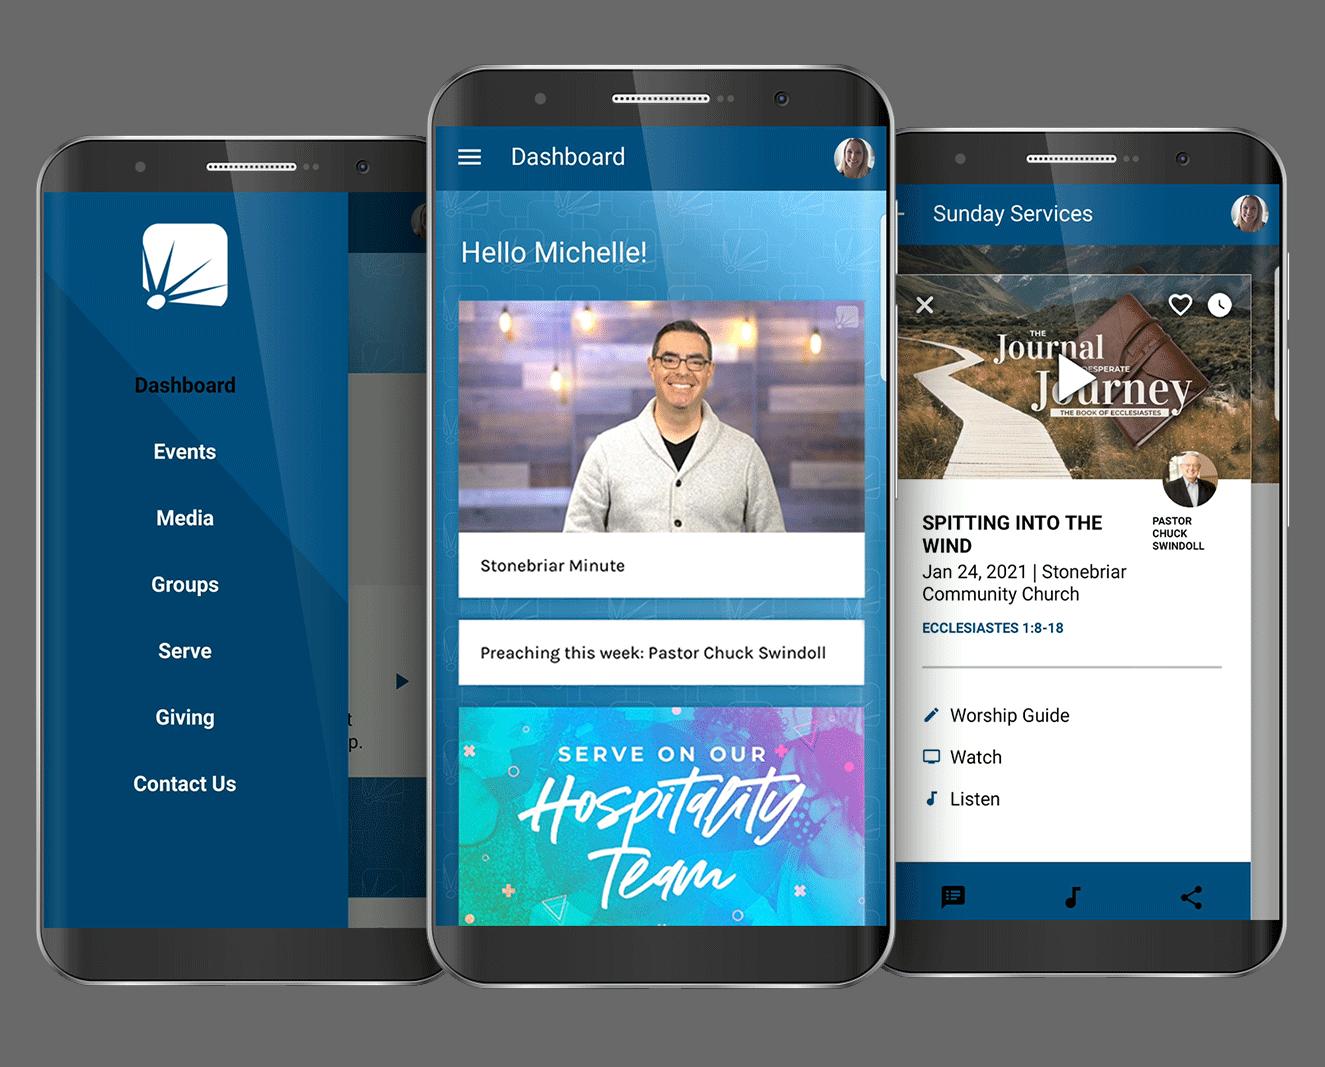 phone with Stonebriar App